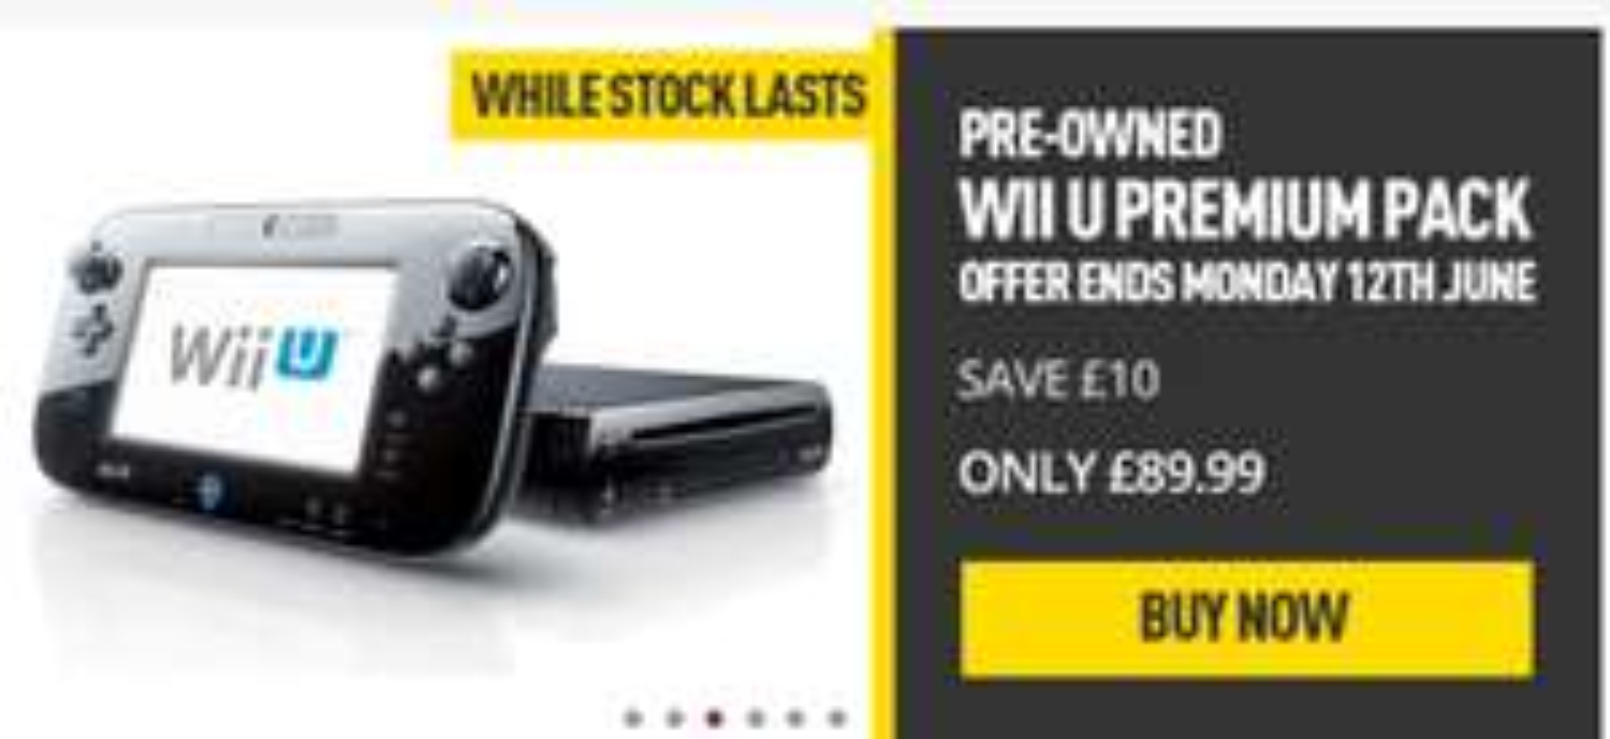 Wii U 32GB Premium Black Console (Fair Condition) Preowned £89.99 delivered @ Game